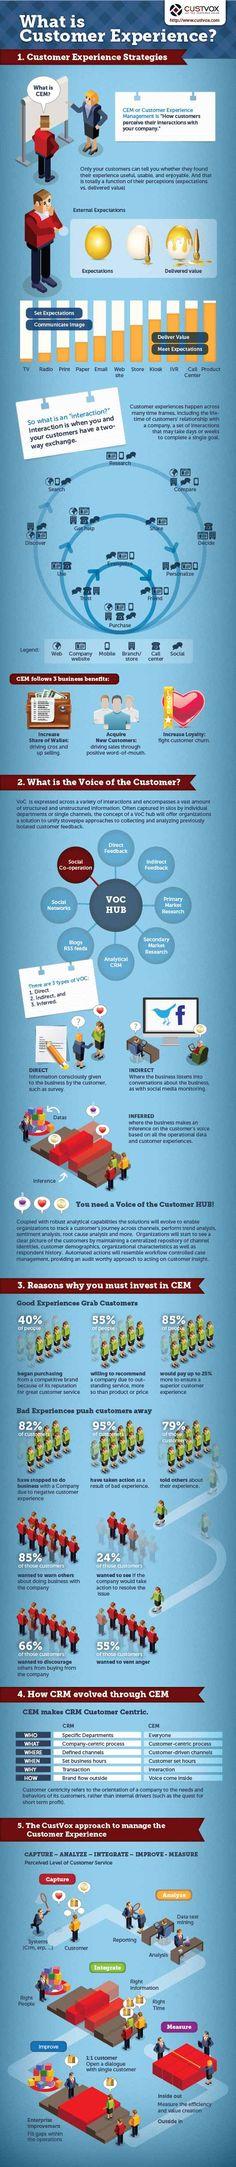 ¿Sabes lo que es el Customer Experience Management? #infografia #infographic #marketing